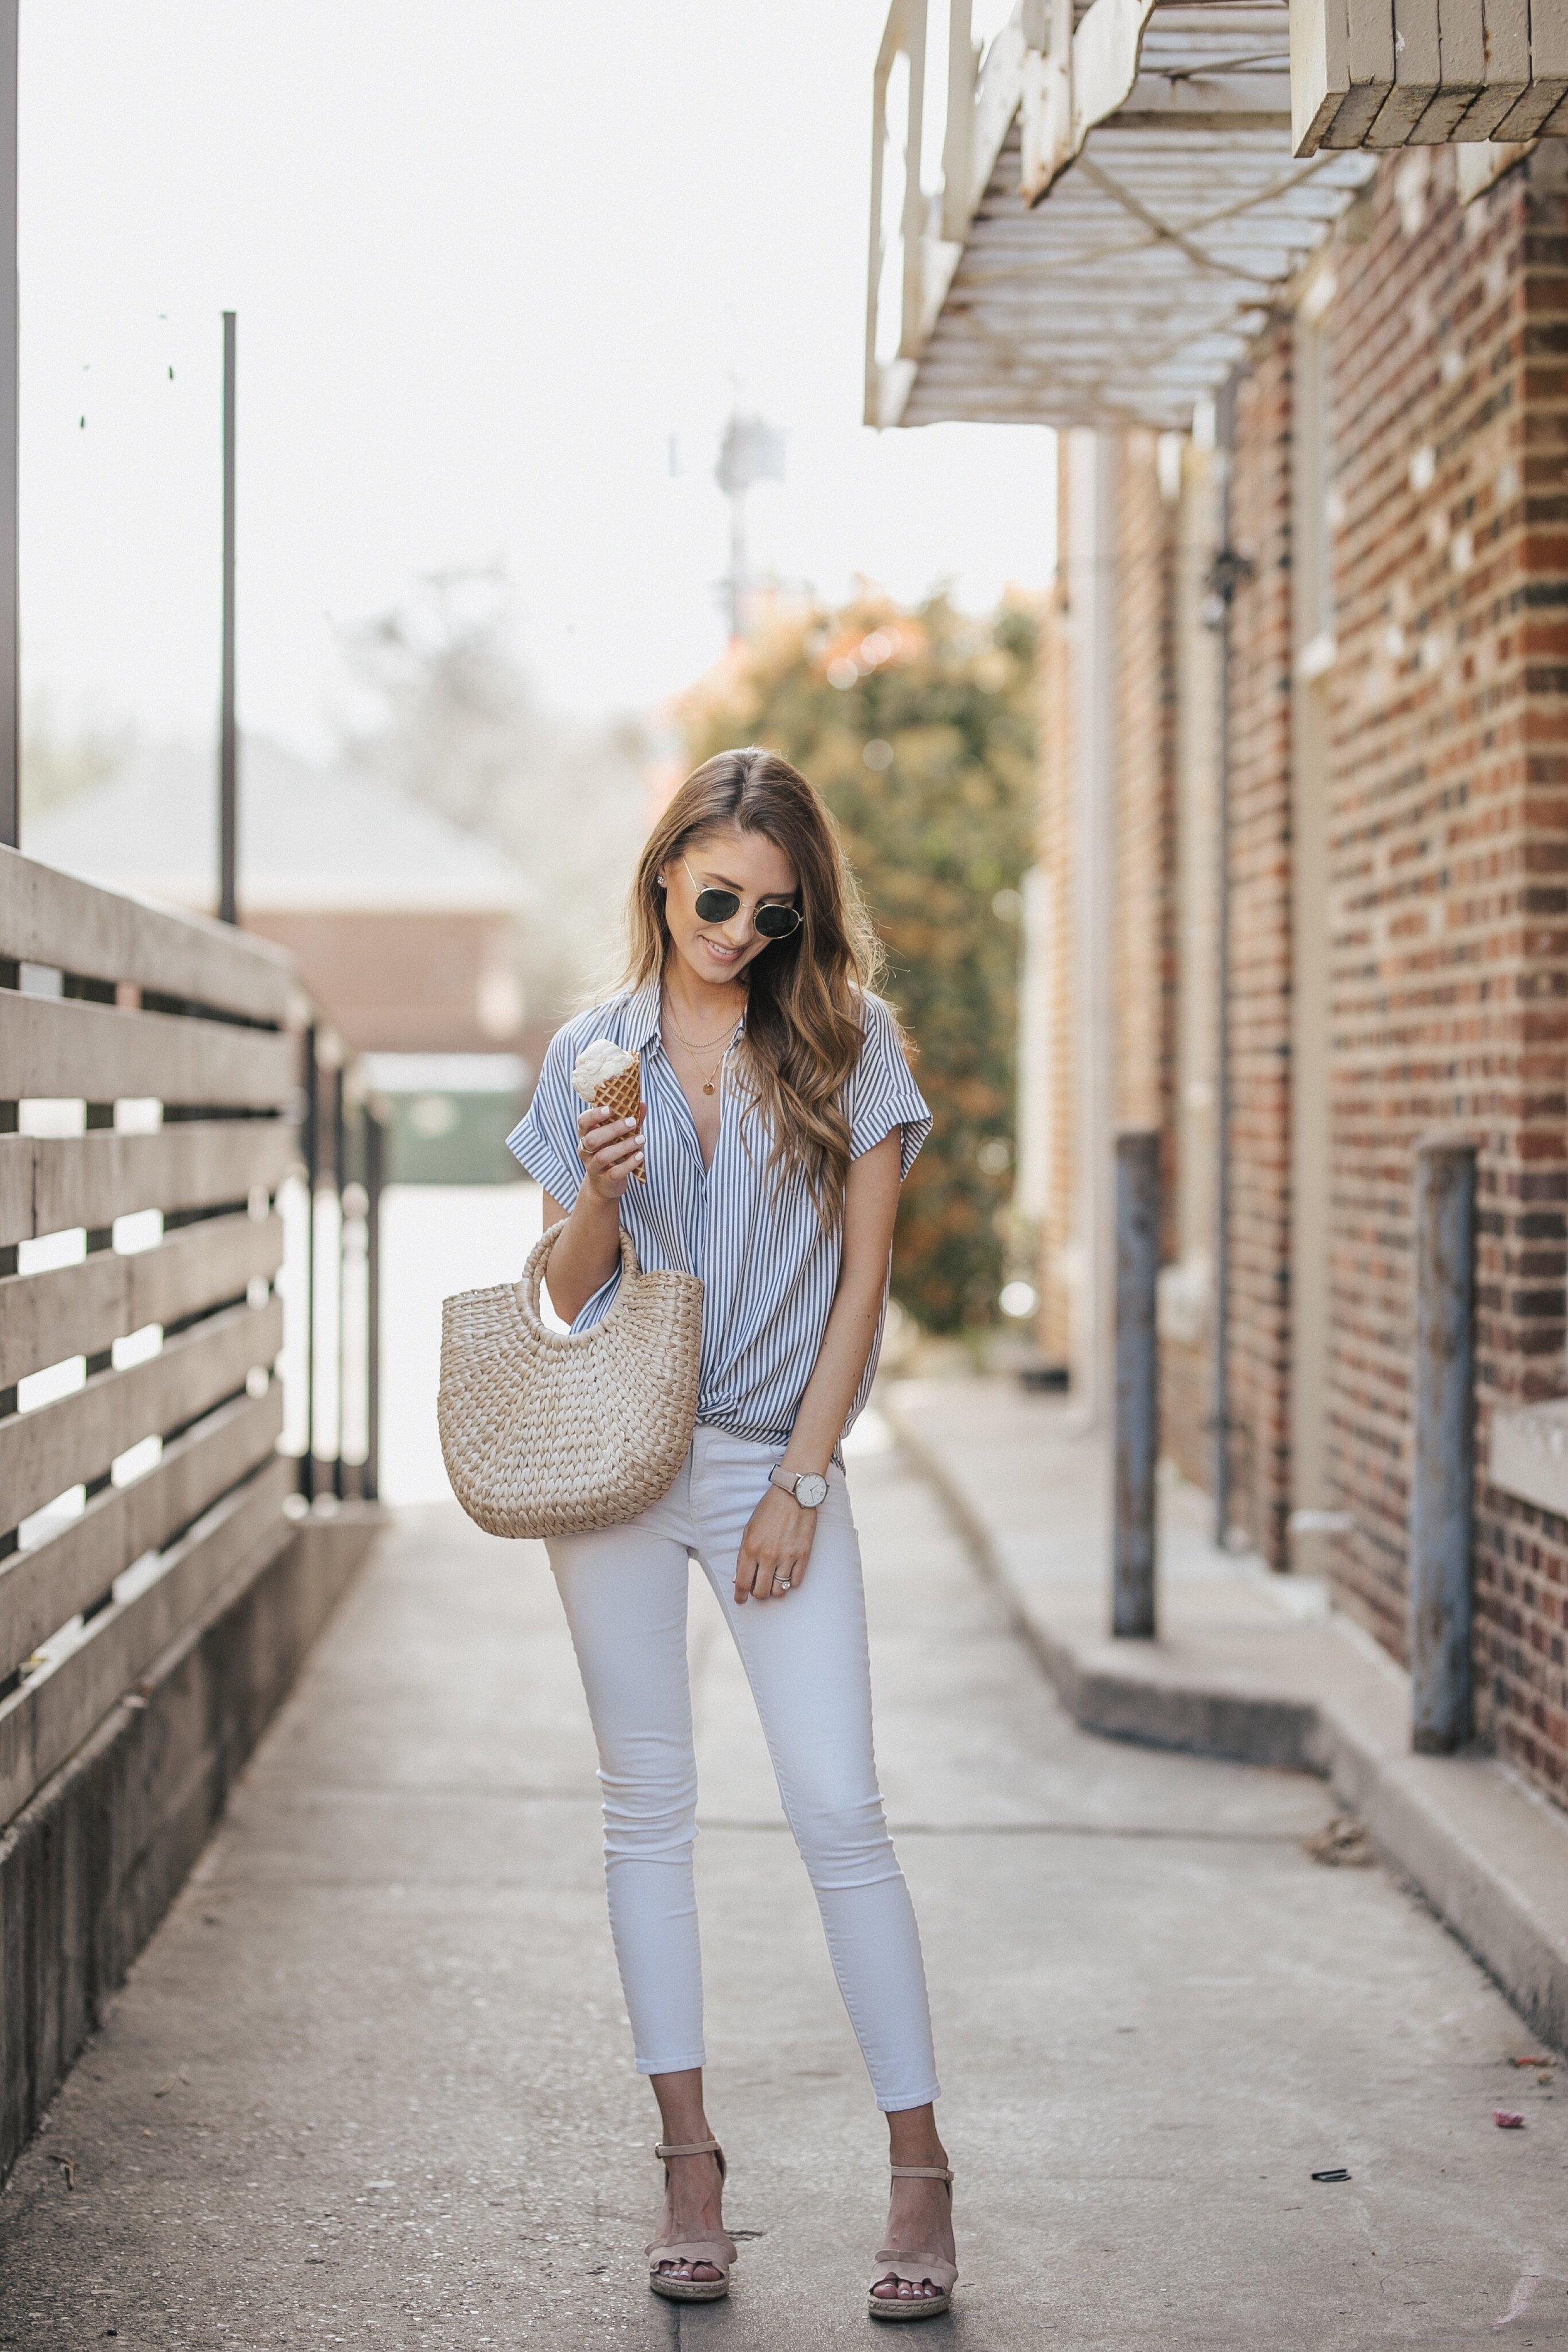 Striped Madewell Top + White Denim